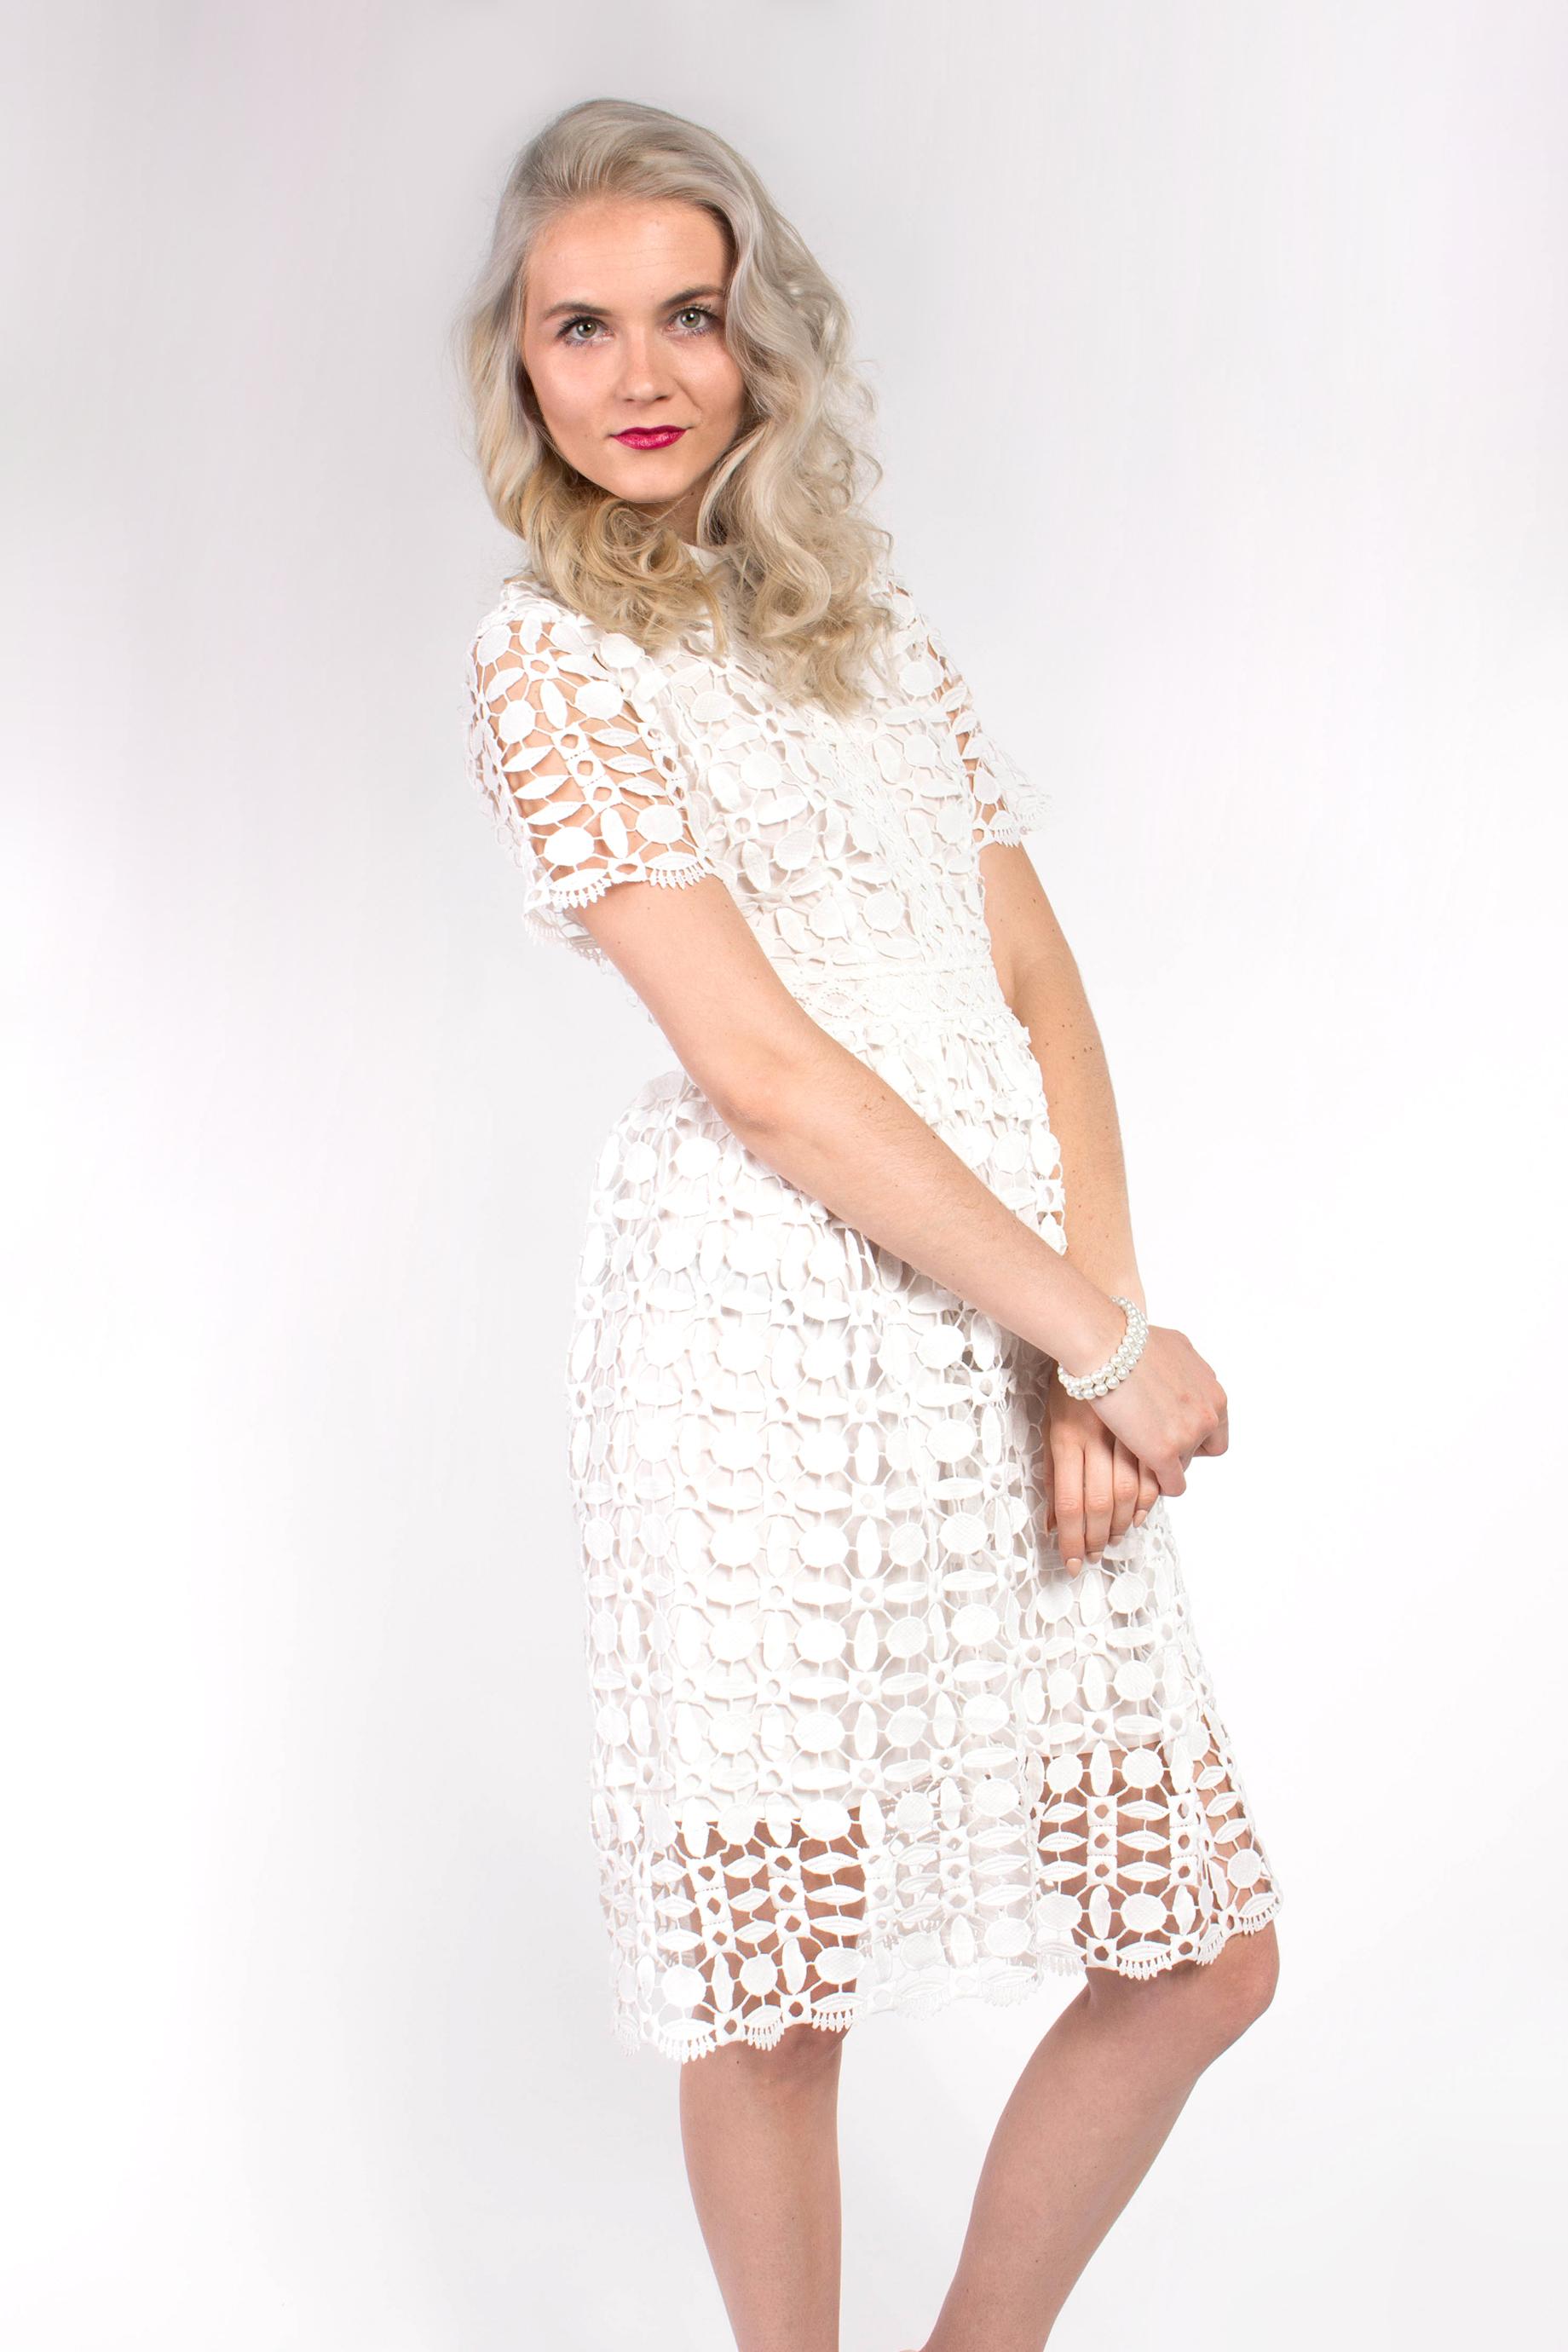 02b3a1fd4548 obrázok 2 Chicwish biele čipkované šaty